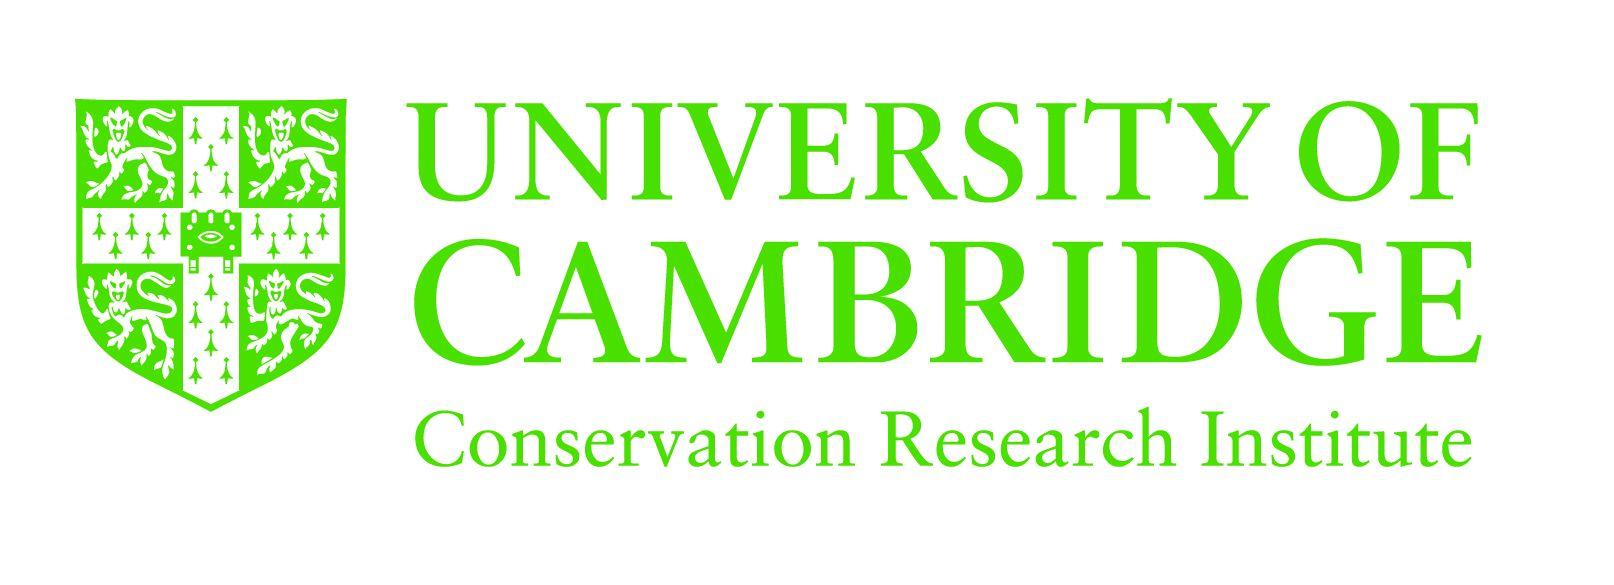 UCCRI logo green as challenge.jpg